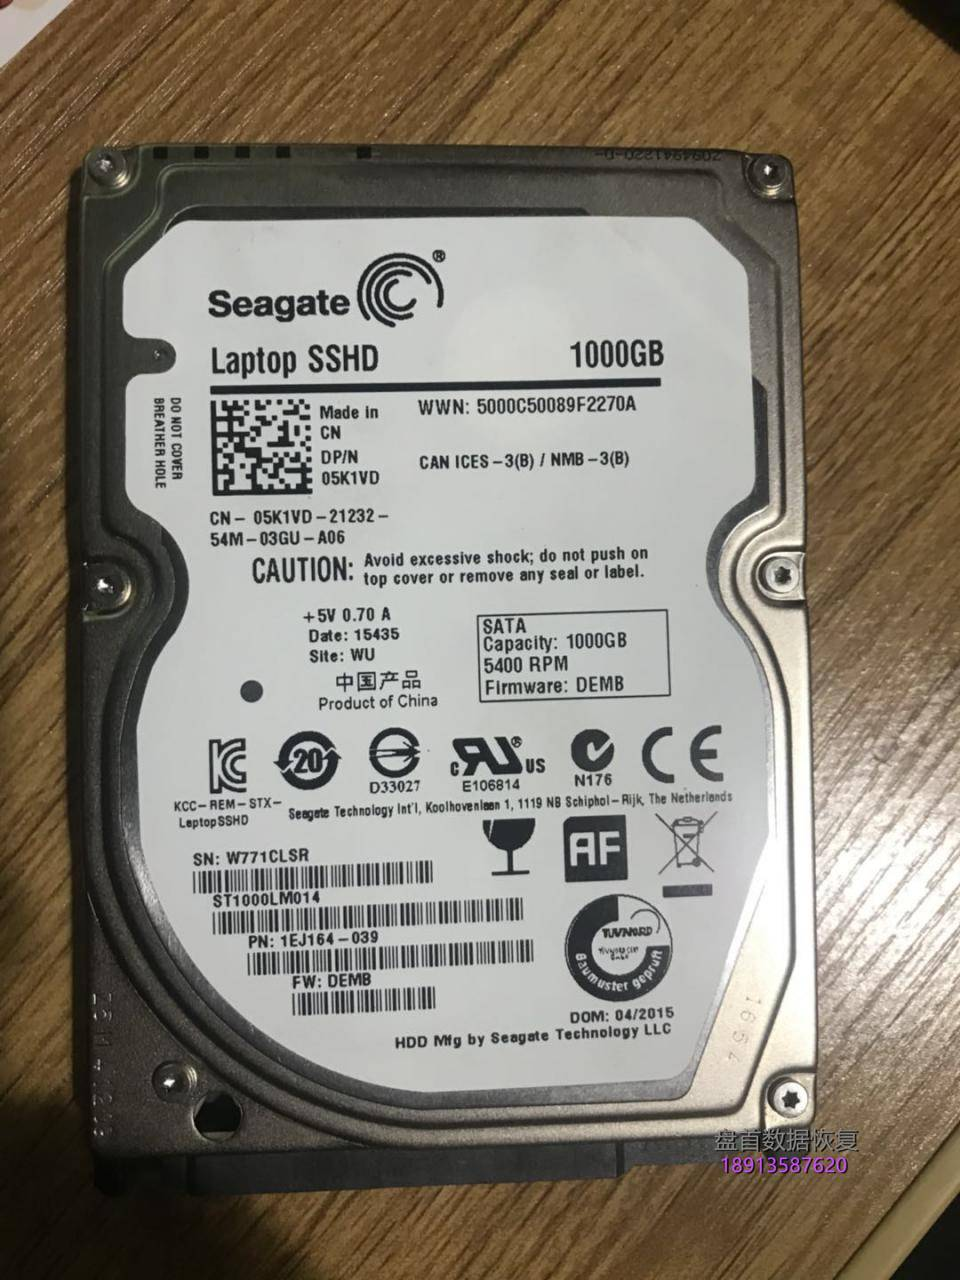 st1000lm014硬盘通电不转这是希捷sshd固态混合硬盘的nand芯片故 ST1000LM014硬盘通电不转这是希捷SSHD固态混合硬盘的NAND芯片故障通病问题数据恢复方法